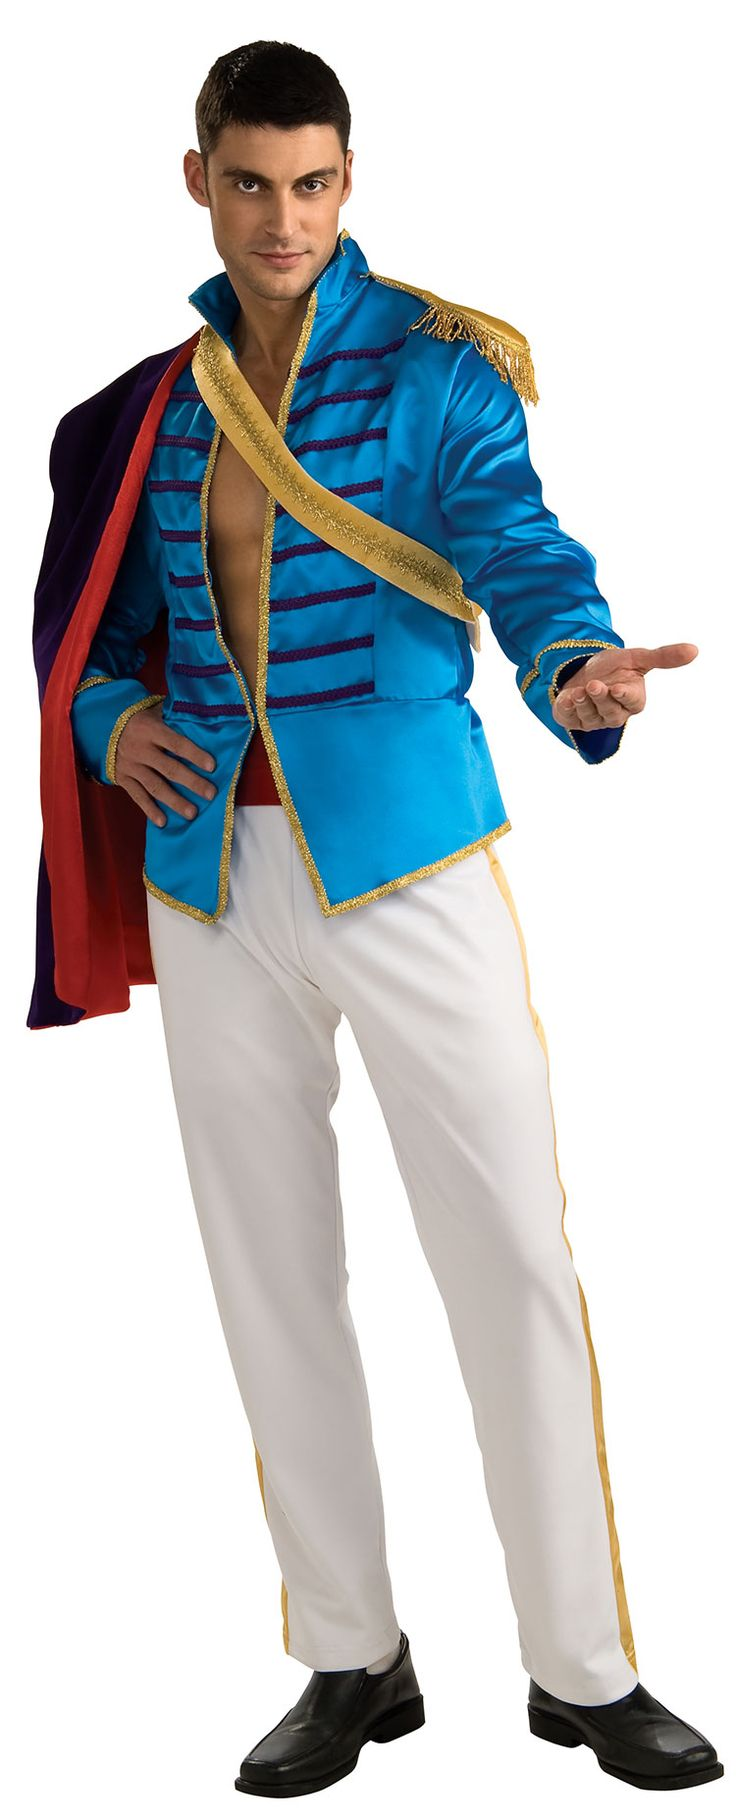 prince charming adult costume prince costumes - Prince Charming Halloween Costumes